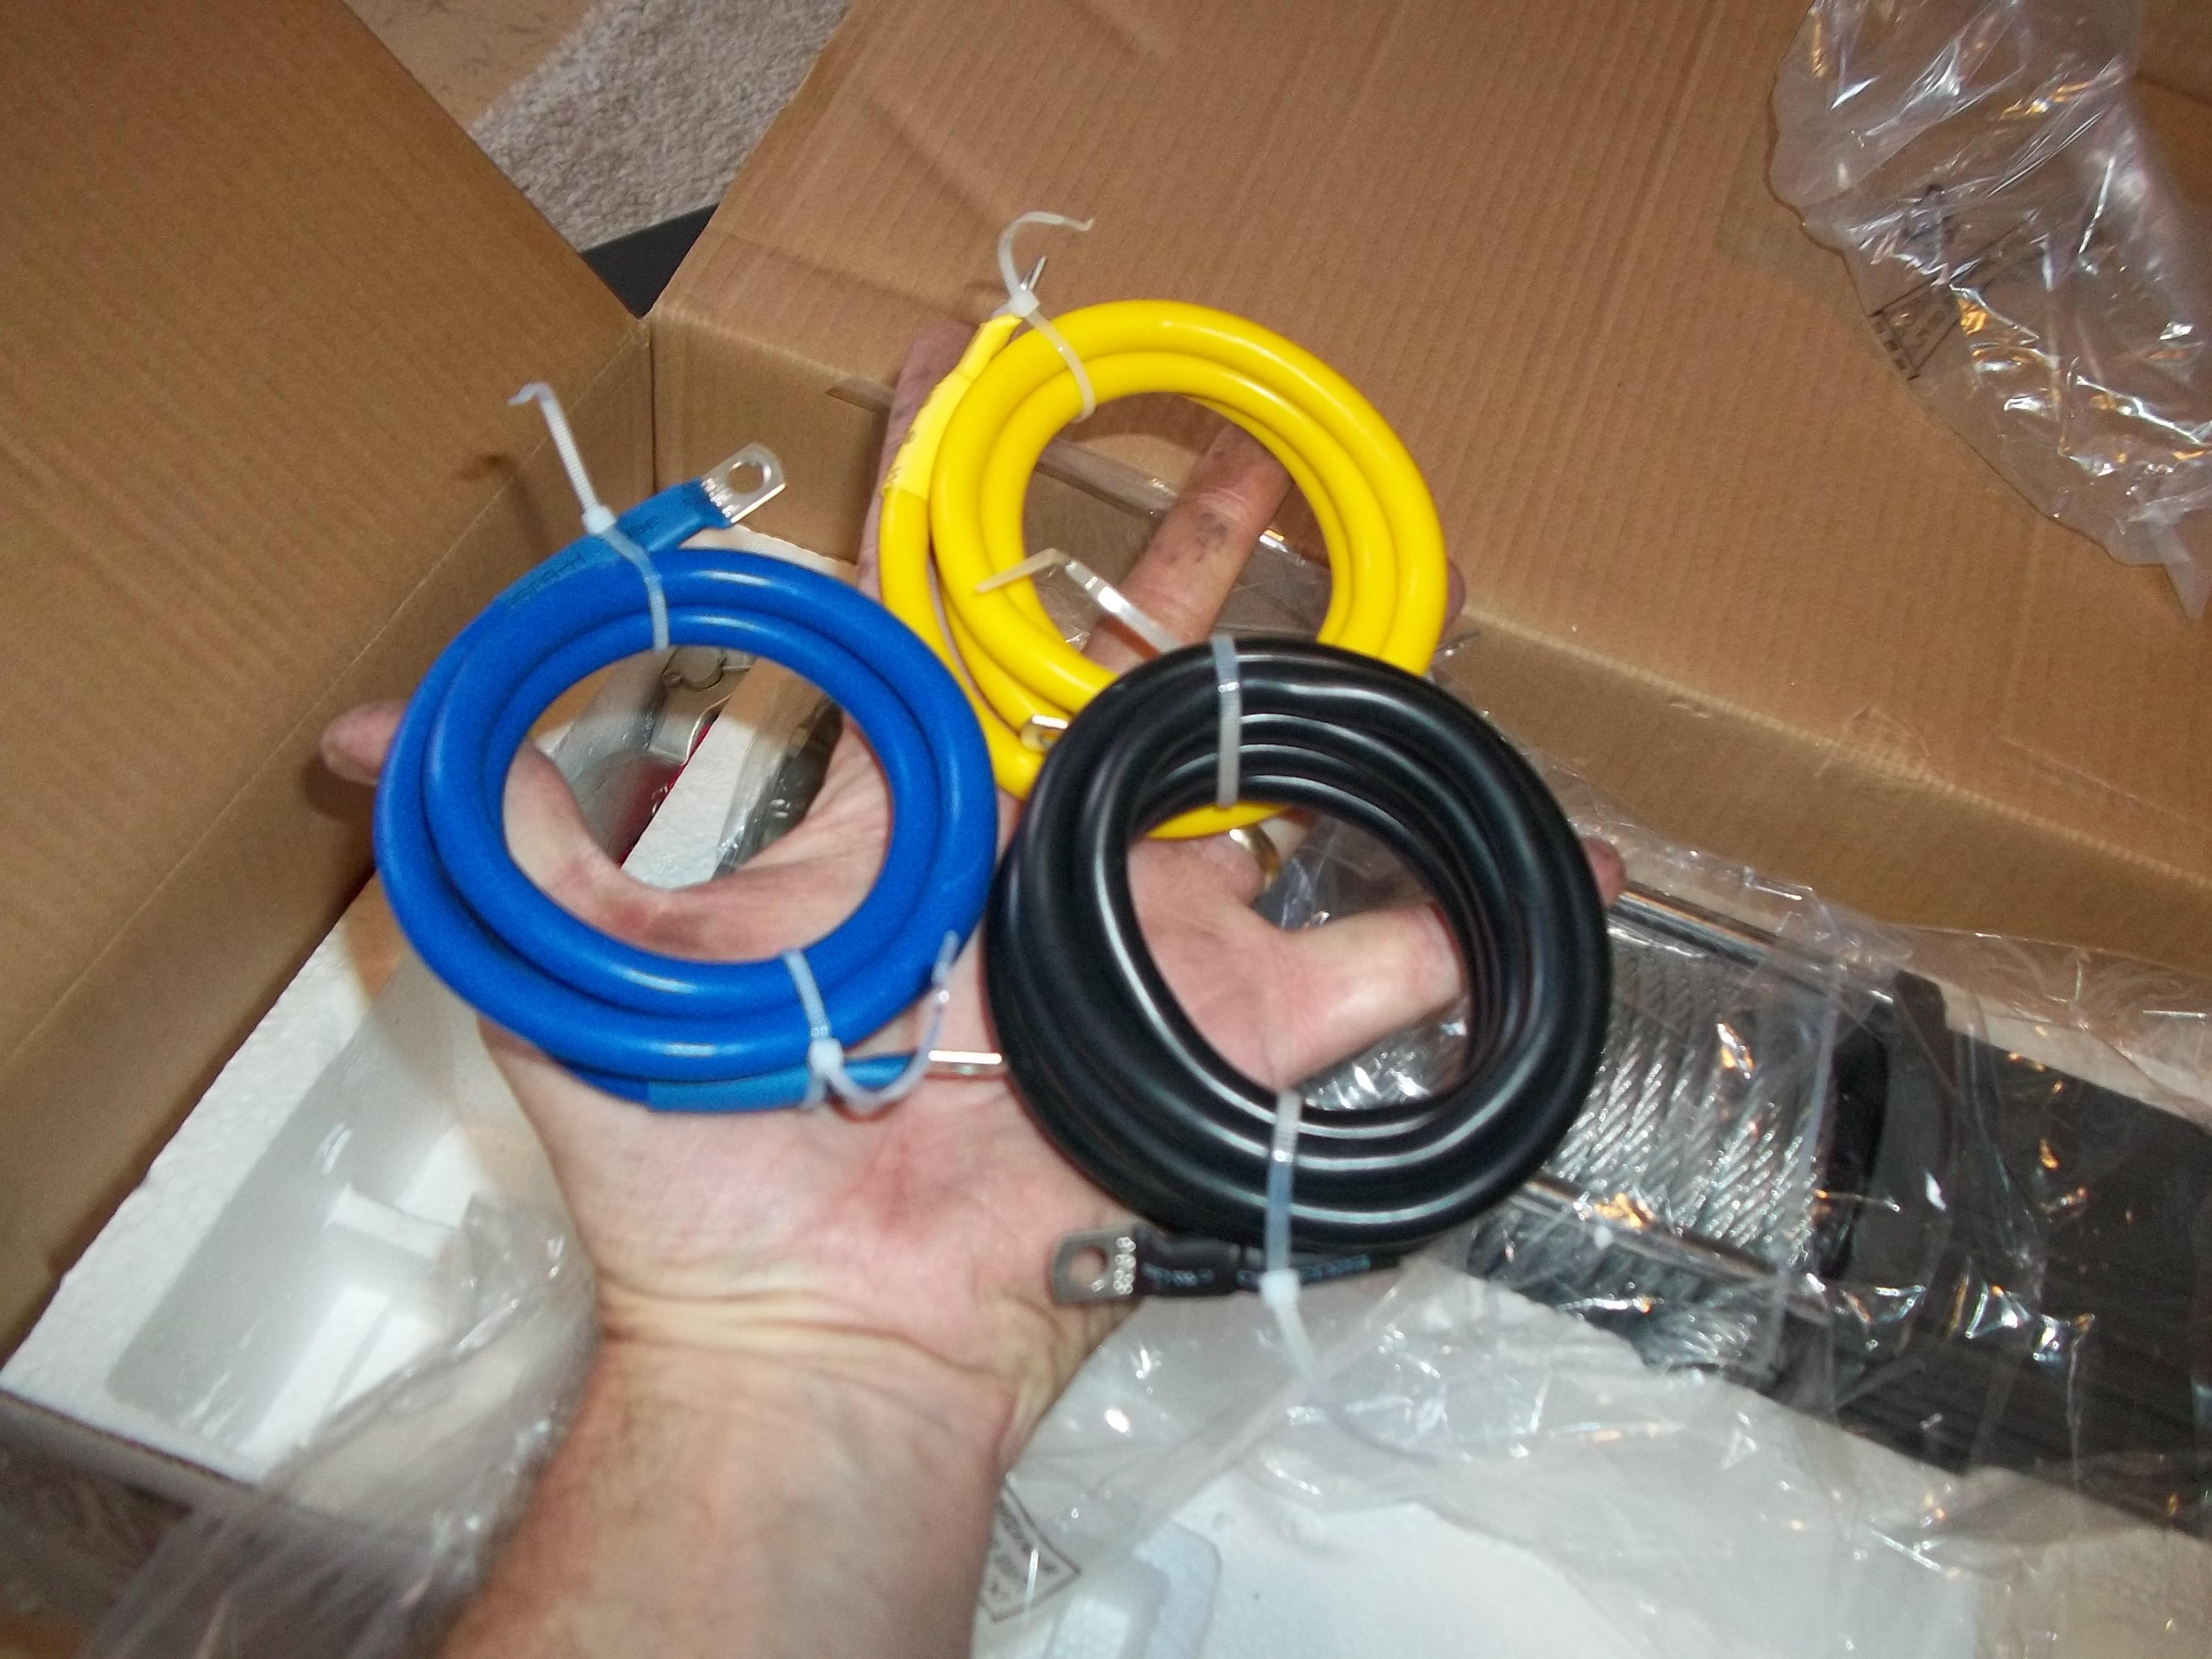 badlands 5000lbs winch installation review Badland Winches Installation attachment 30499attachment 30500attachment 30501attachment